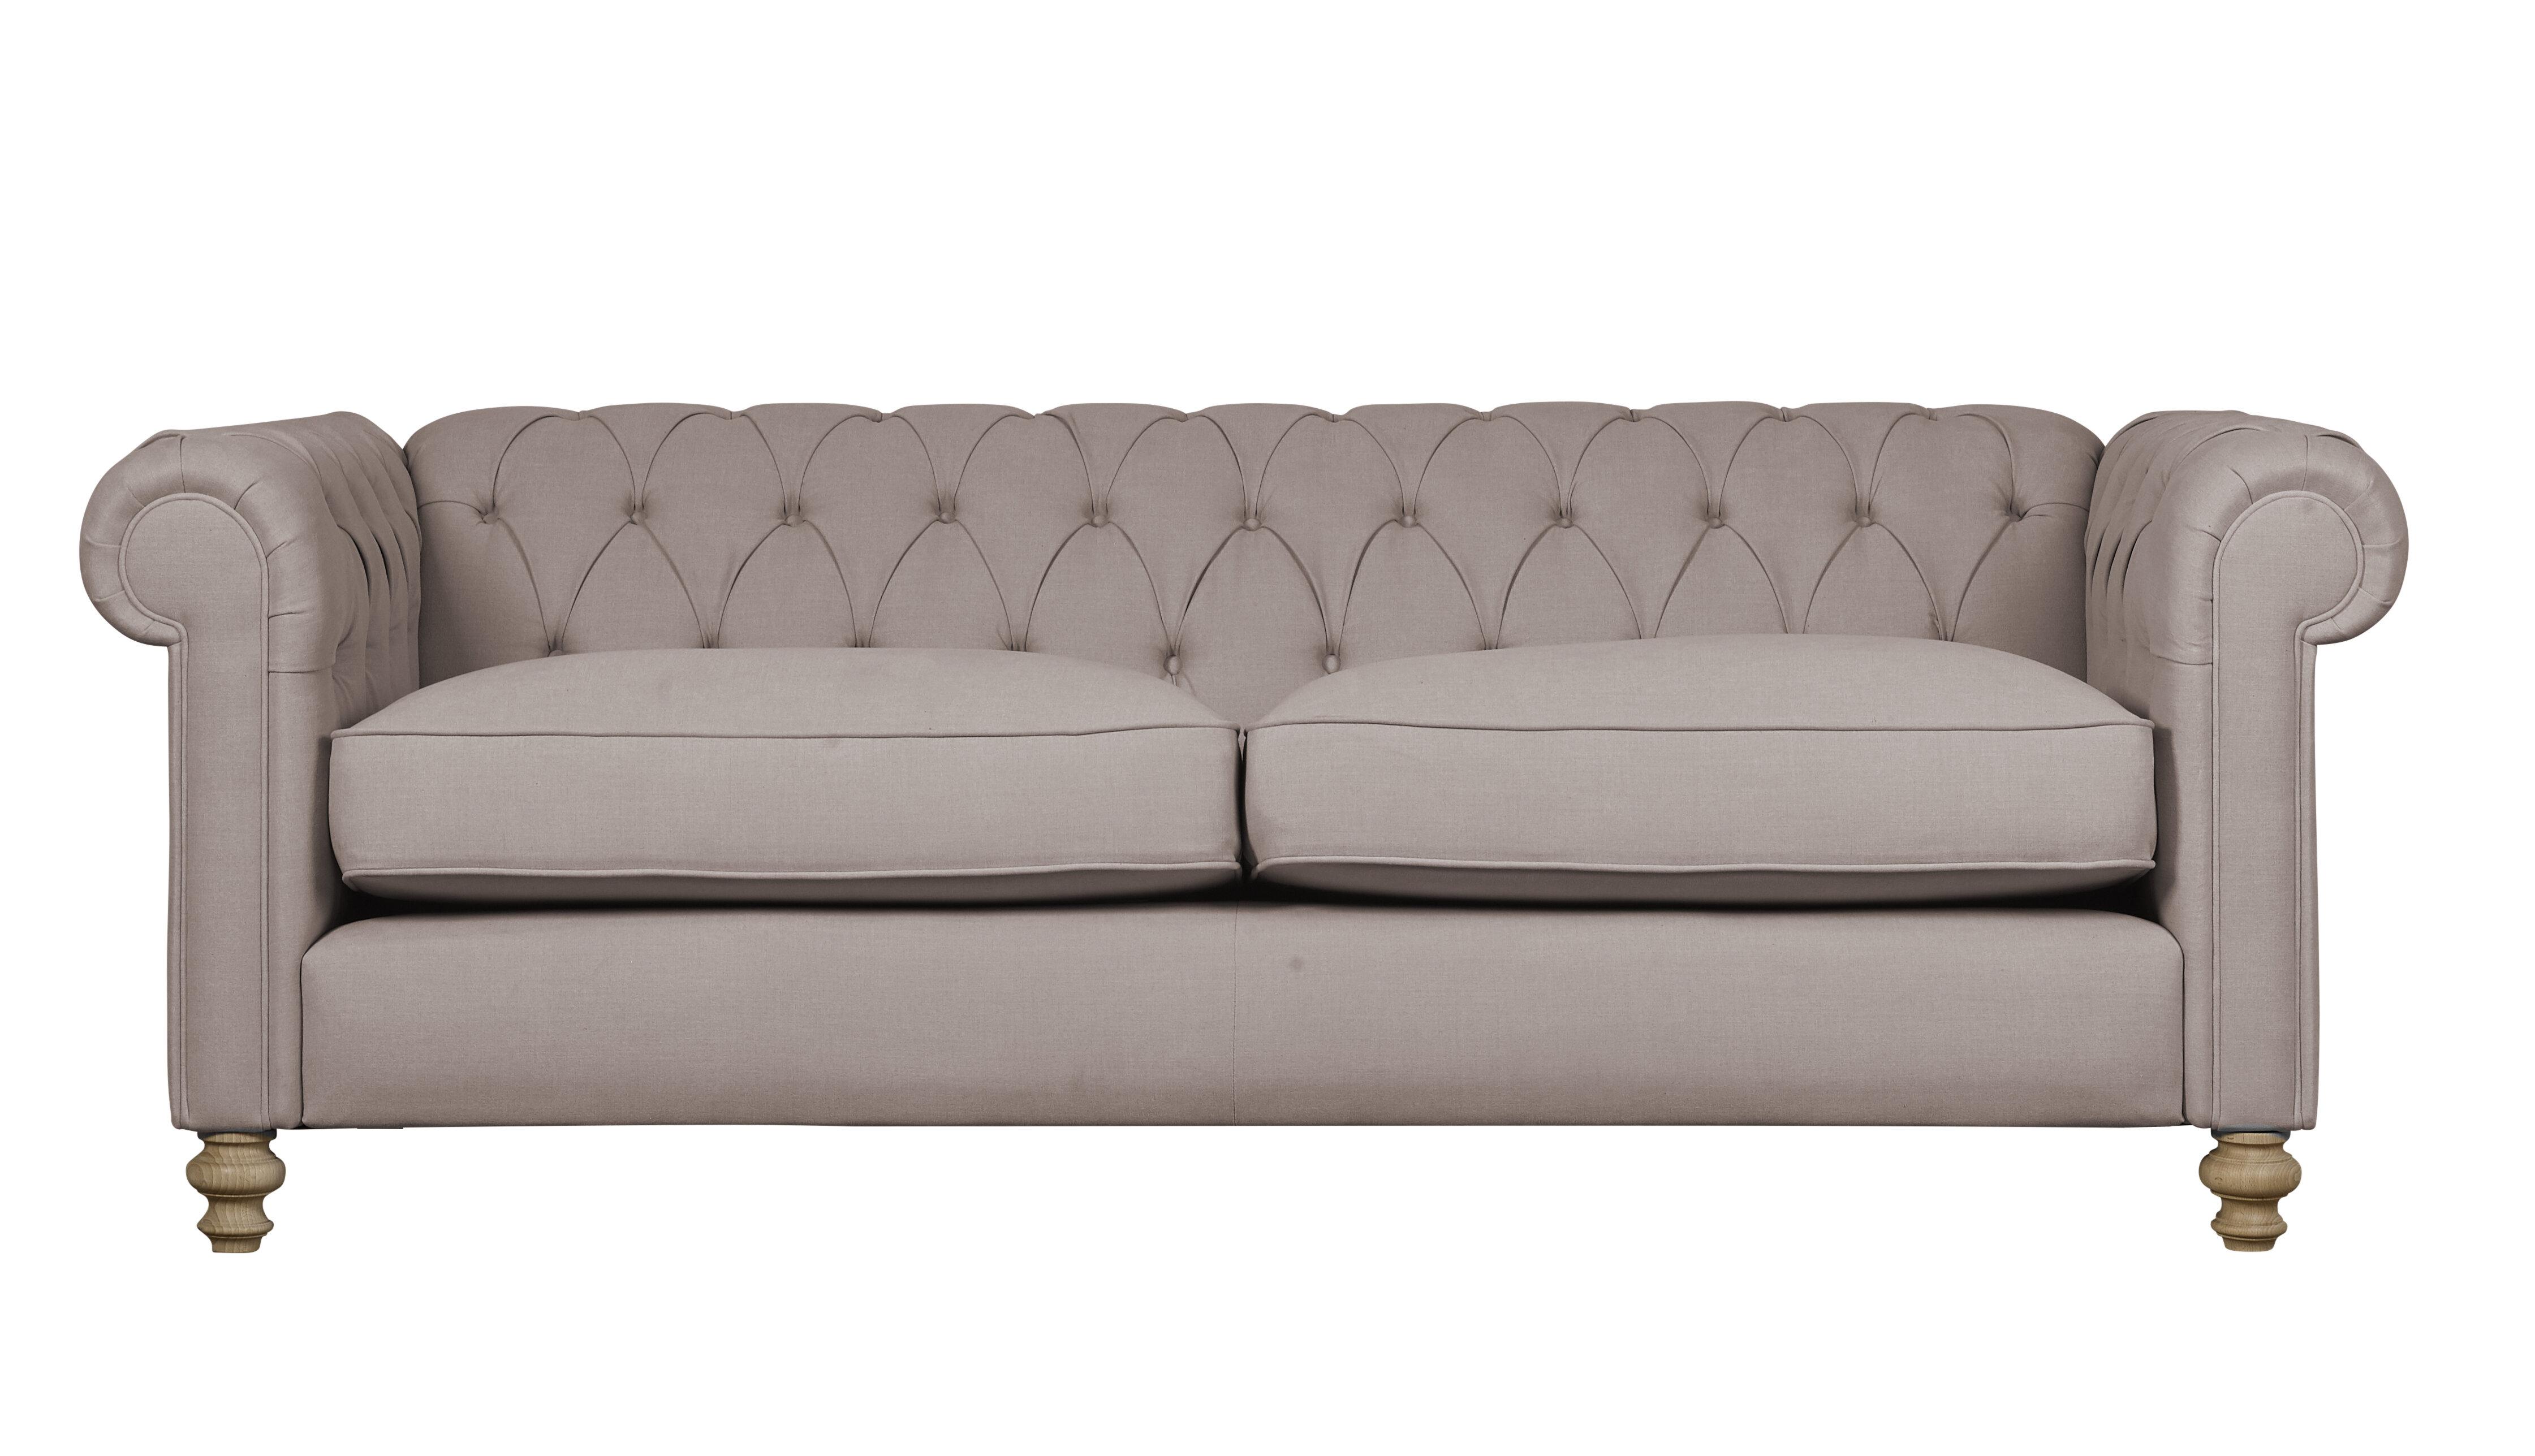 Rosdorf Park Karli Extra Large 4 Seater Chesterfield Sofa | Wayfair ...